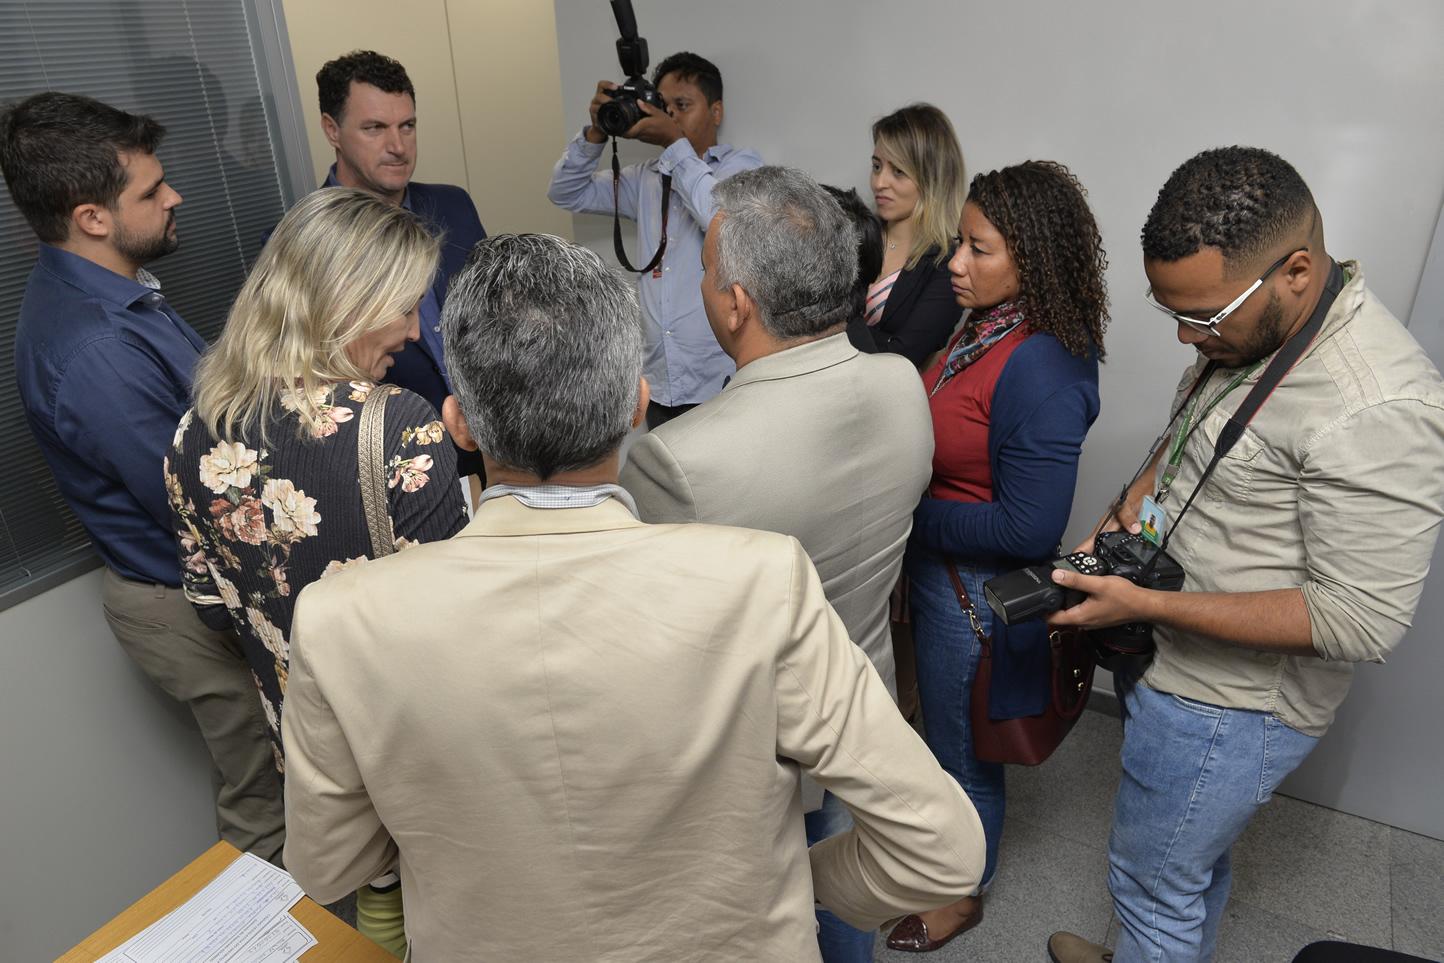 2019.06.13_Visita-aos-gabinetes-contra-o-fim-da-licenca-premio_fotos-Deva-Garcia-24